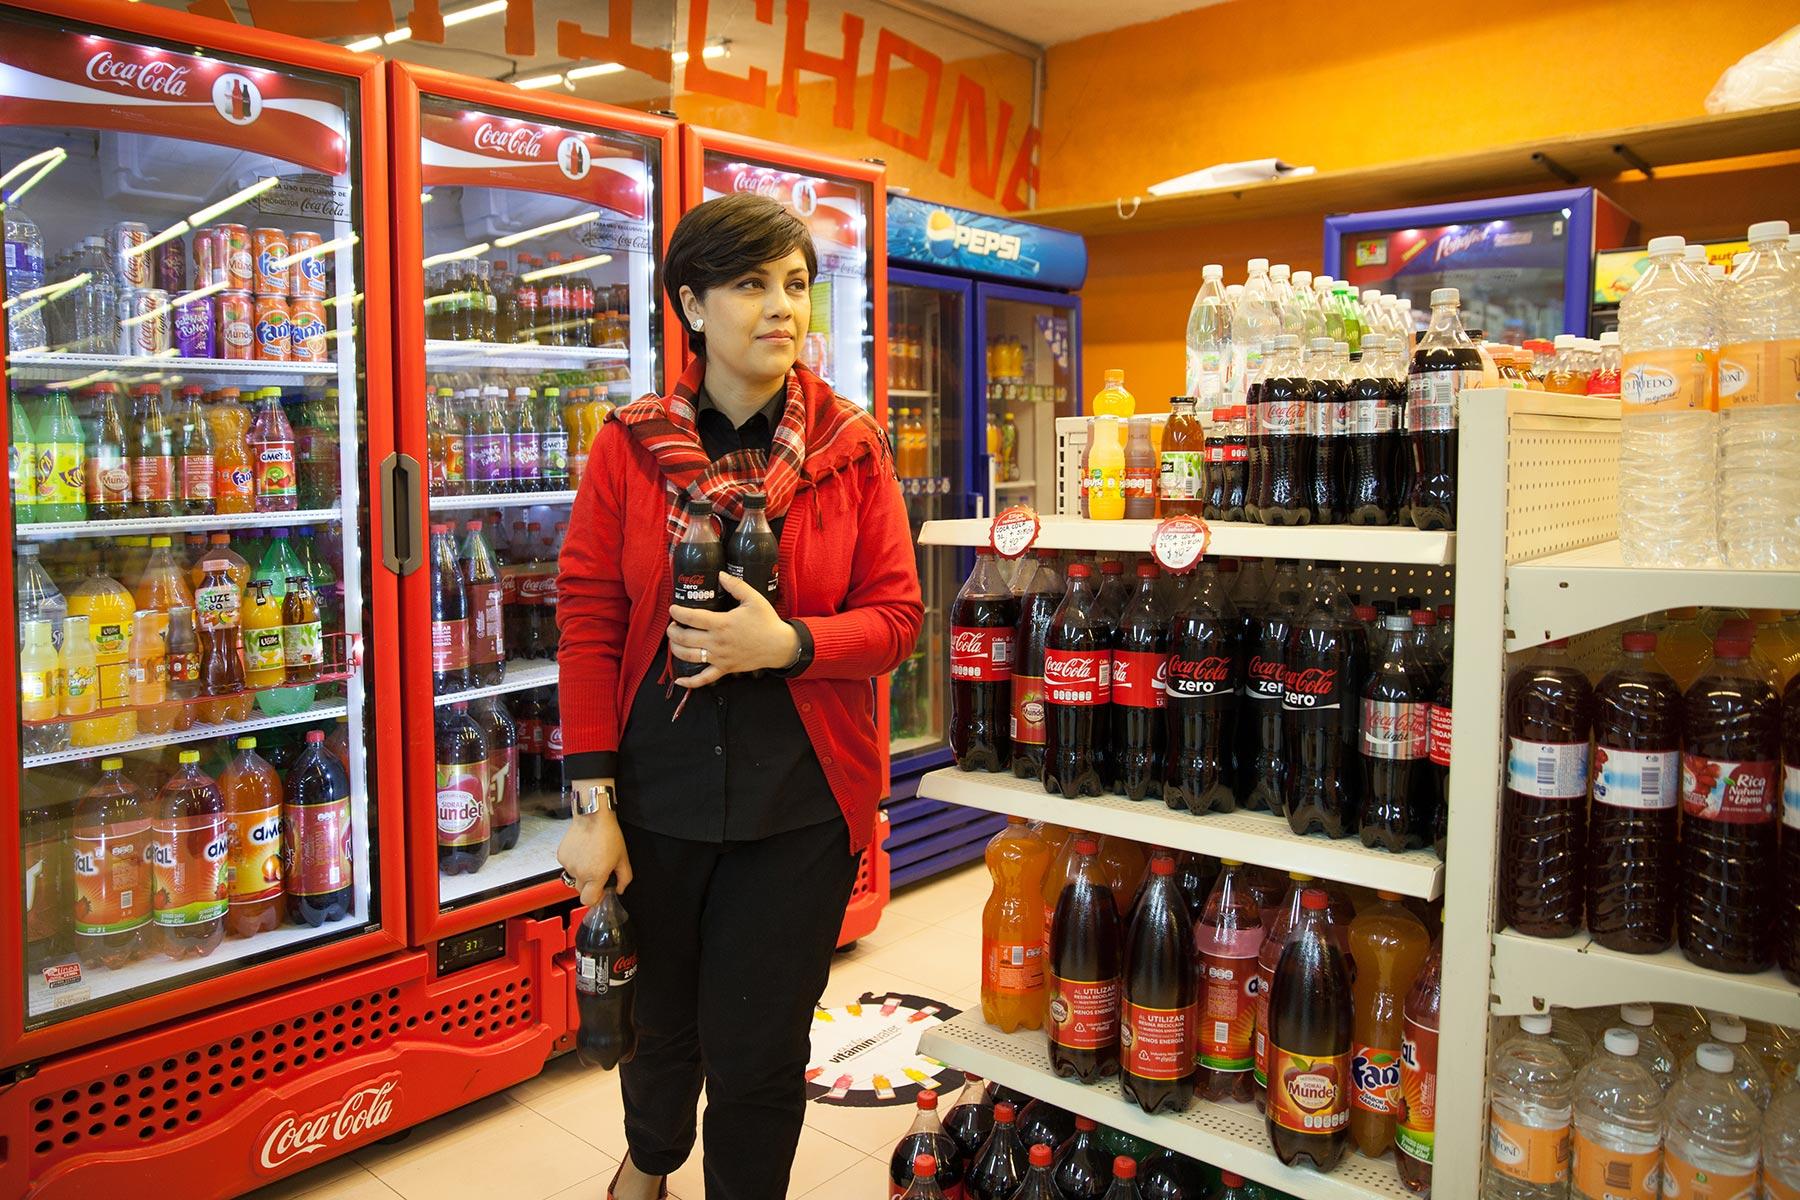 soft drink and coca-cola india essay